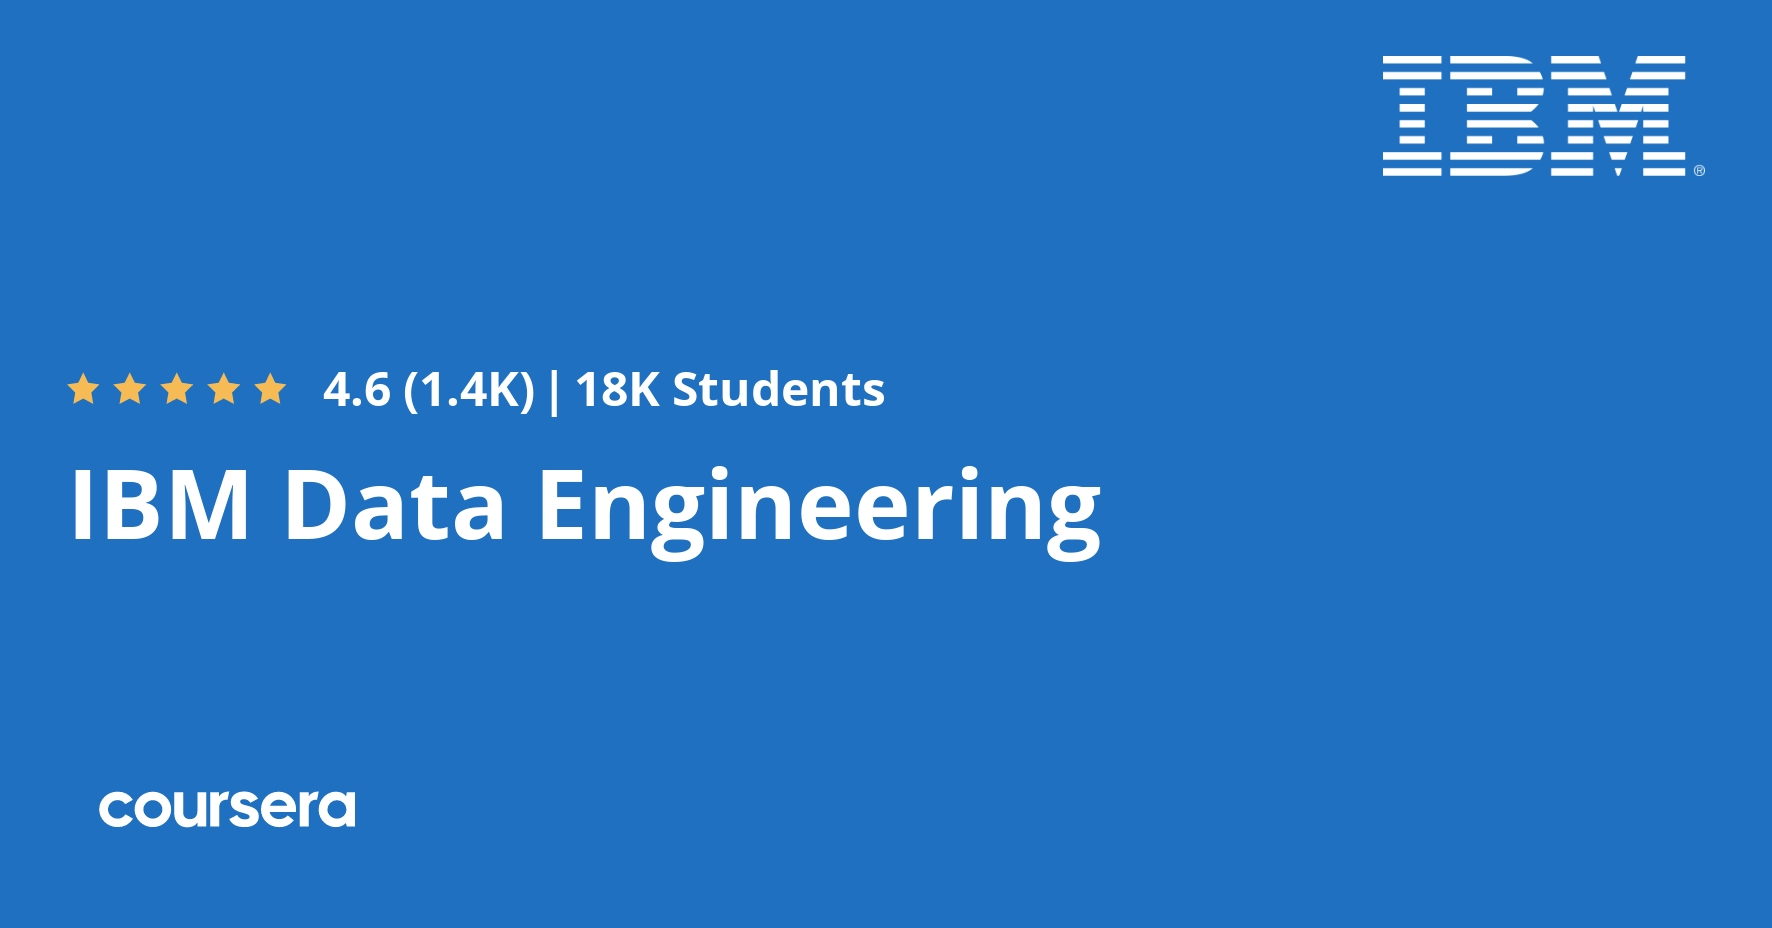 IBM Data Engineering